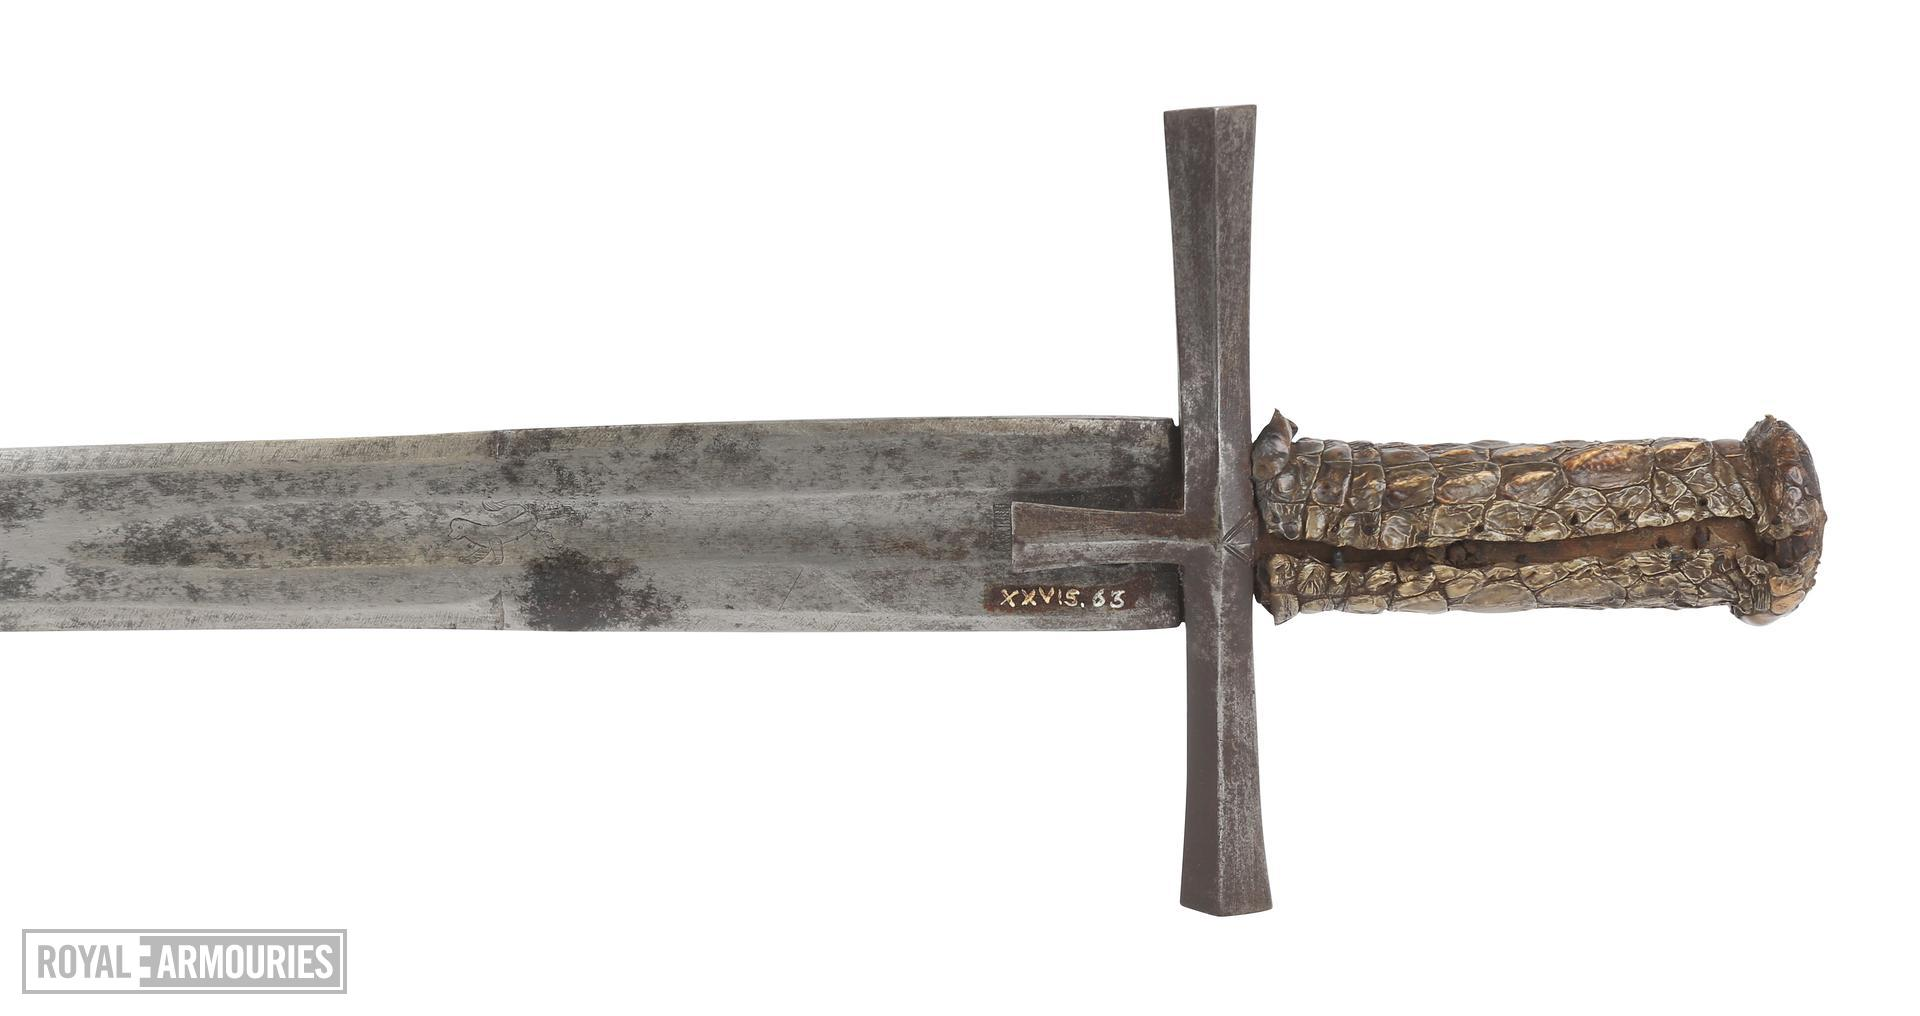 Sword (kaskara) with crocodile skin hilt and a scabbard covered in snake or lizard skin. Sudan, 19th century. XXVIS.63